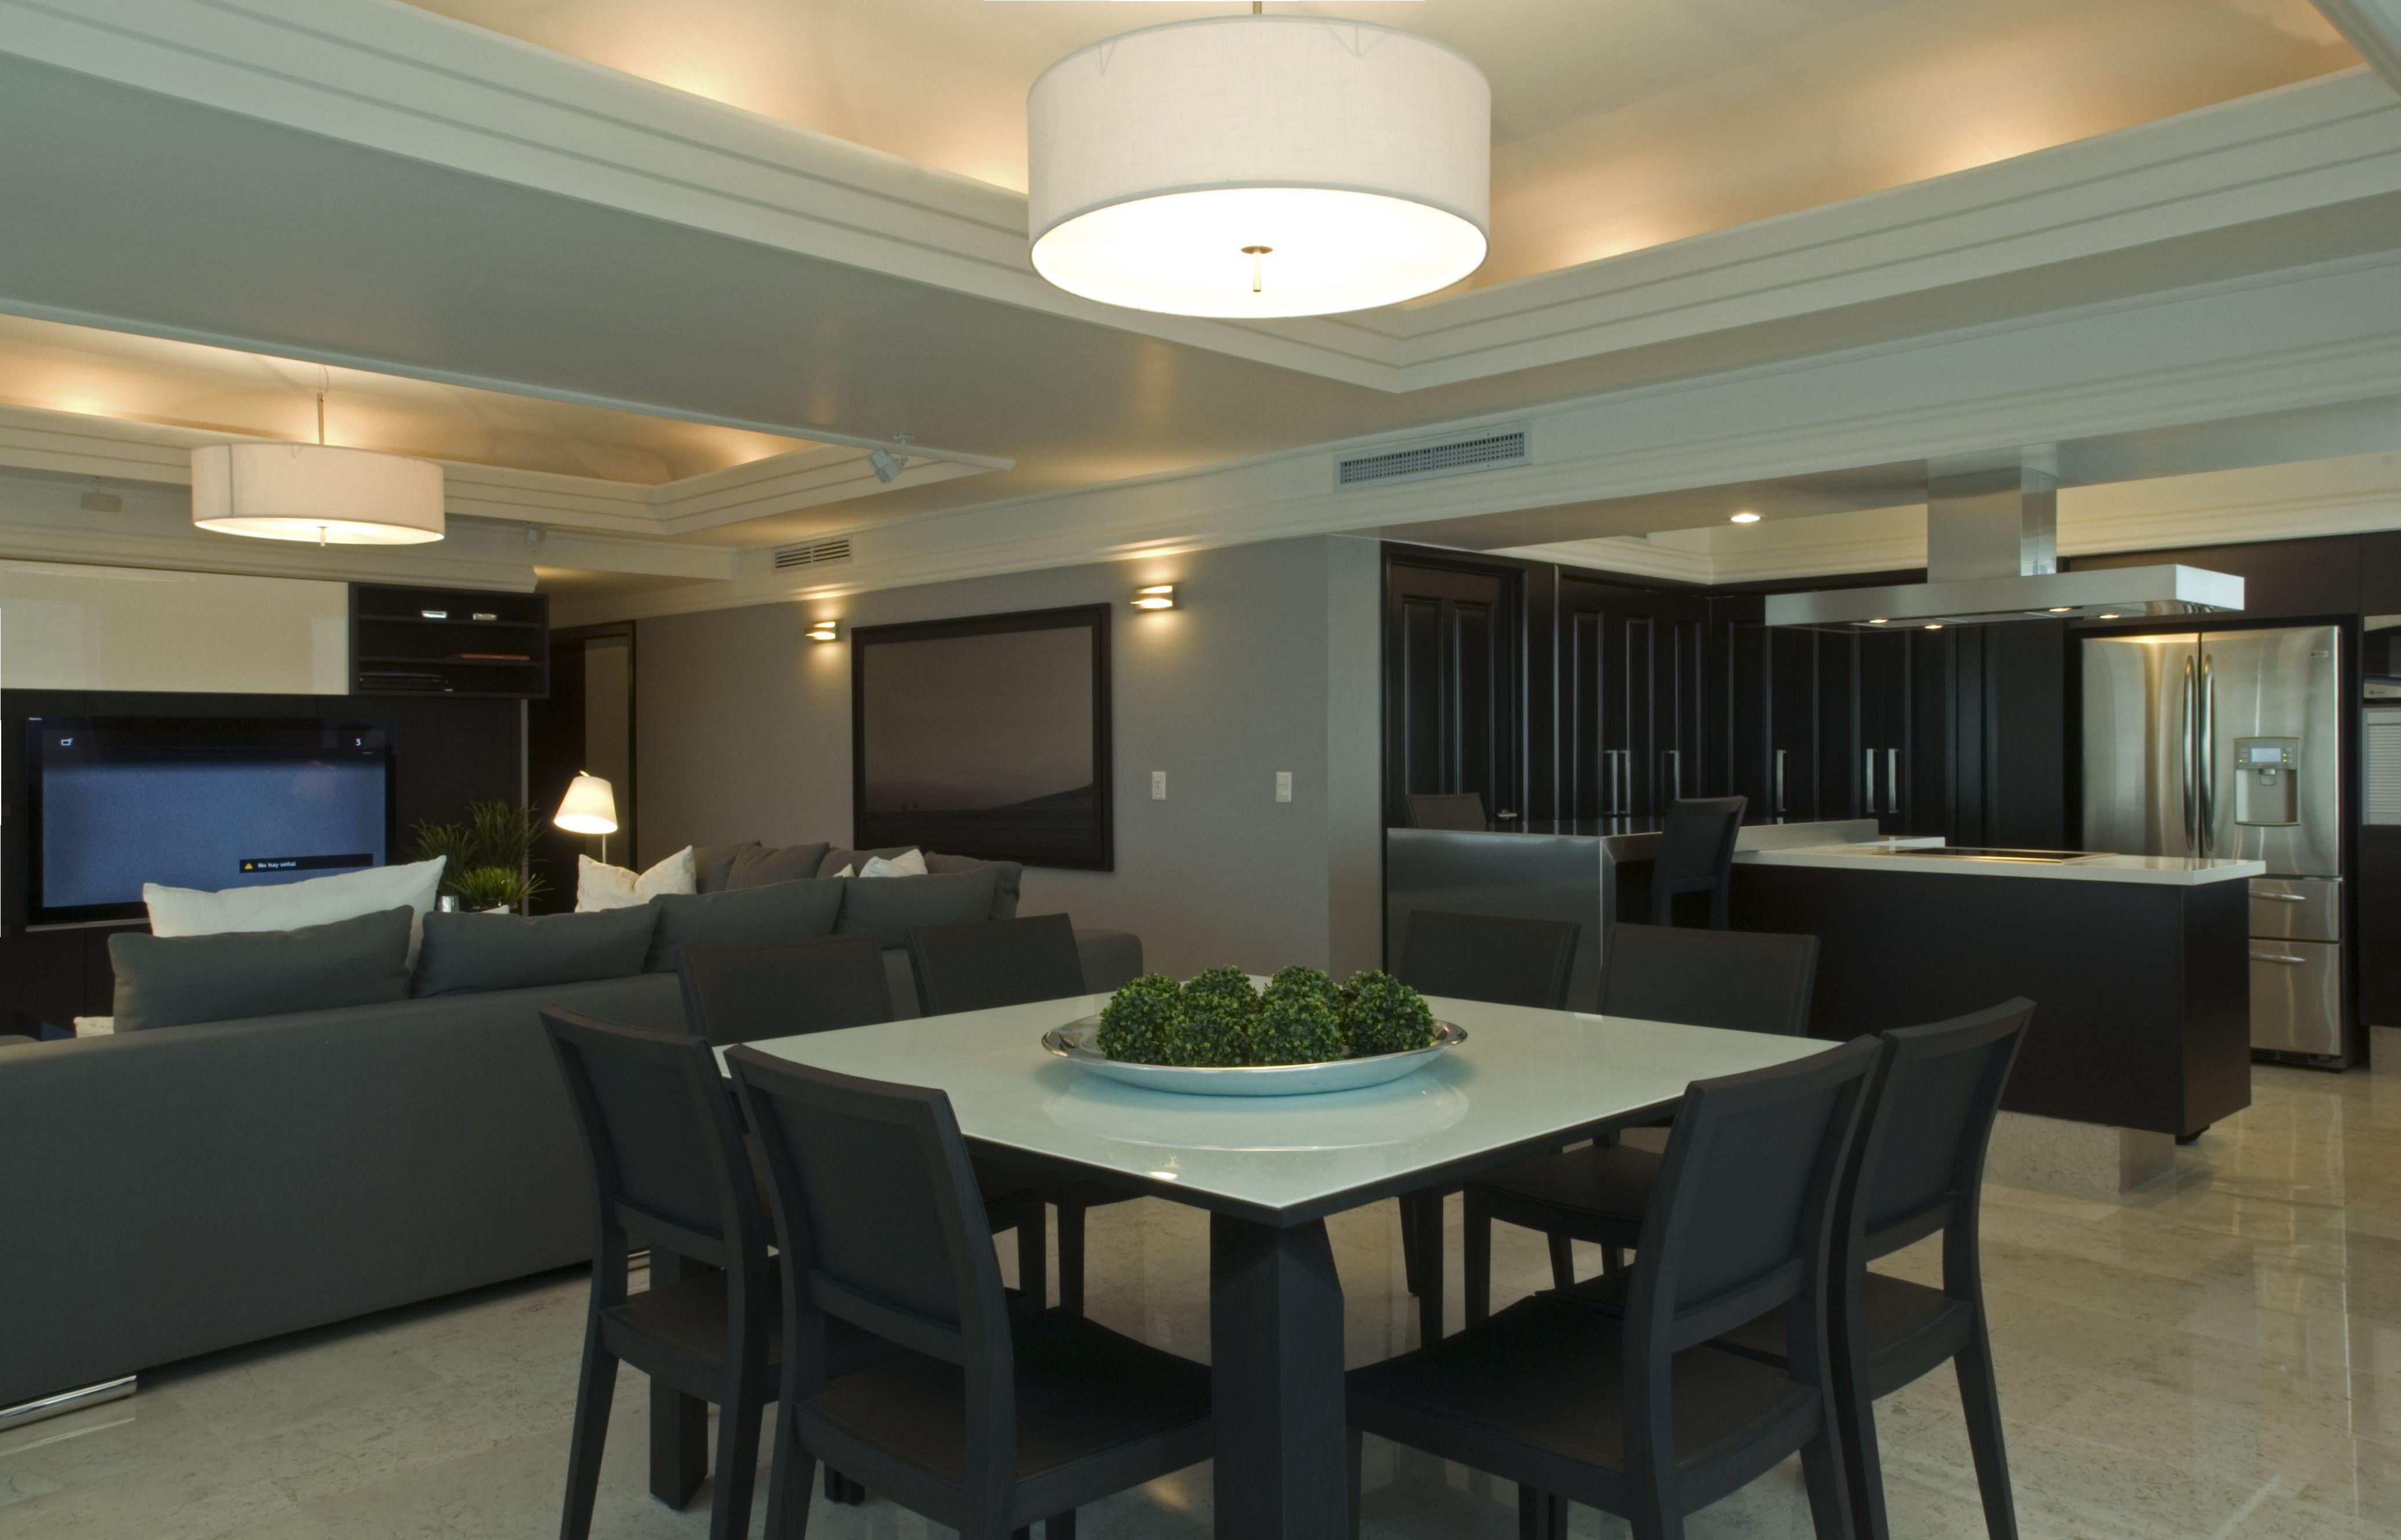 Departamento moderno elegante victoria plasencia for Departamentos modernos interiores